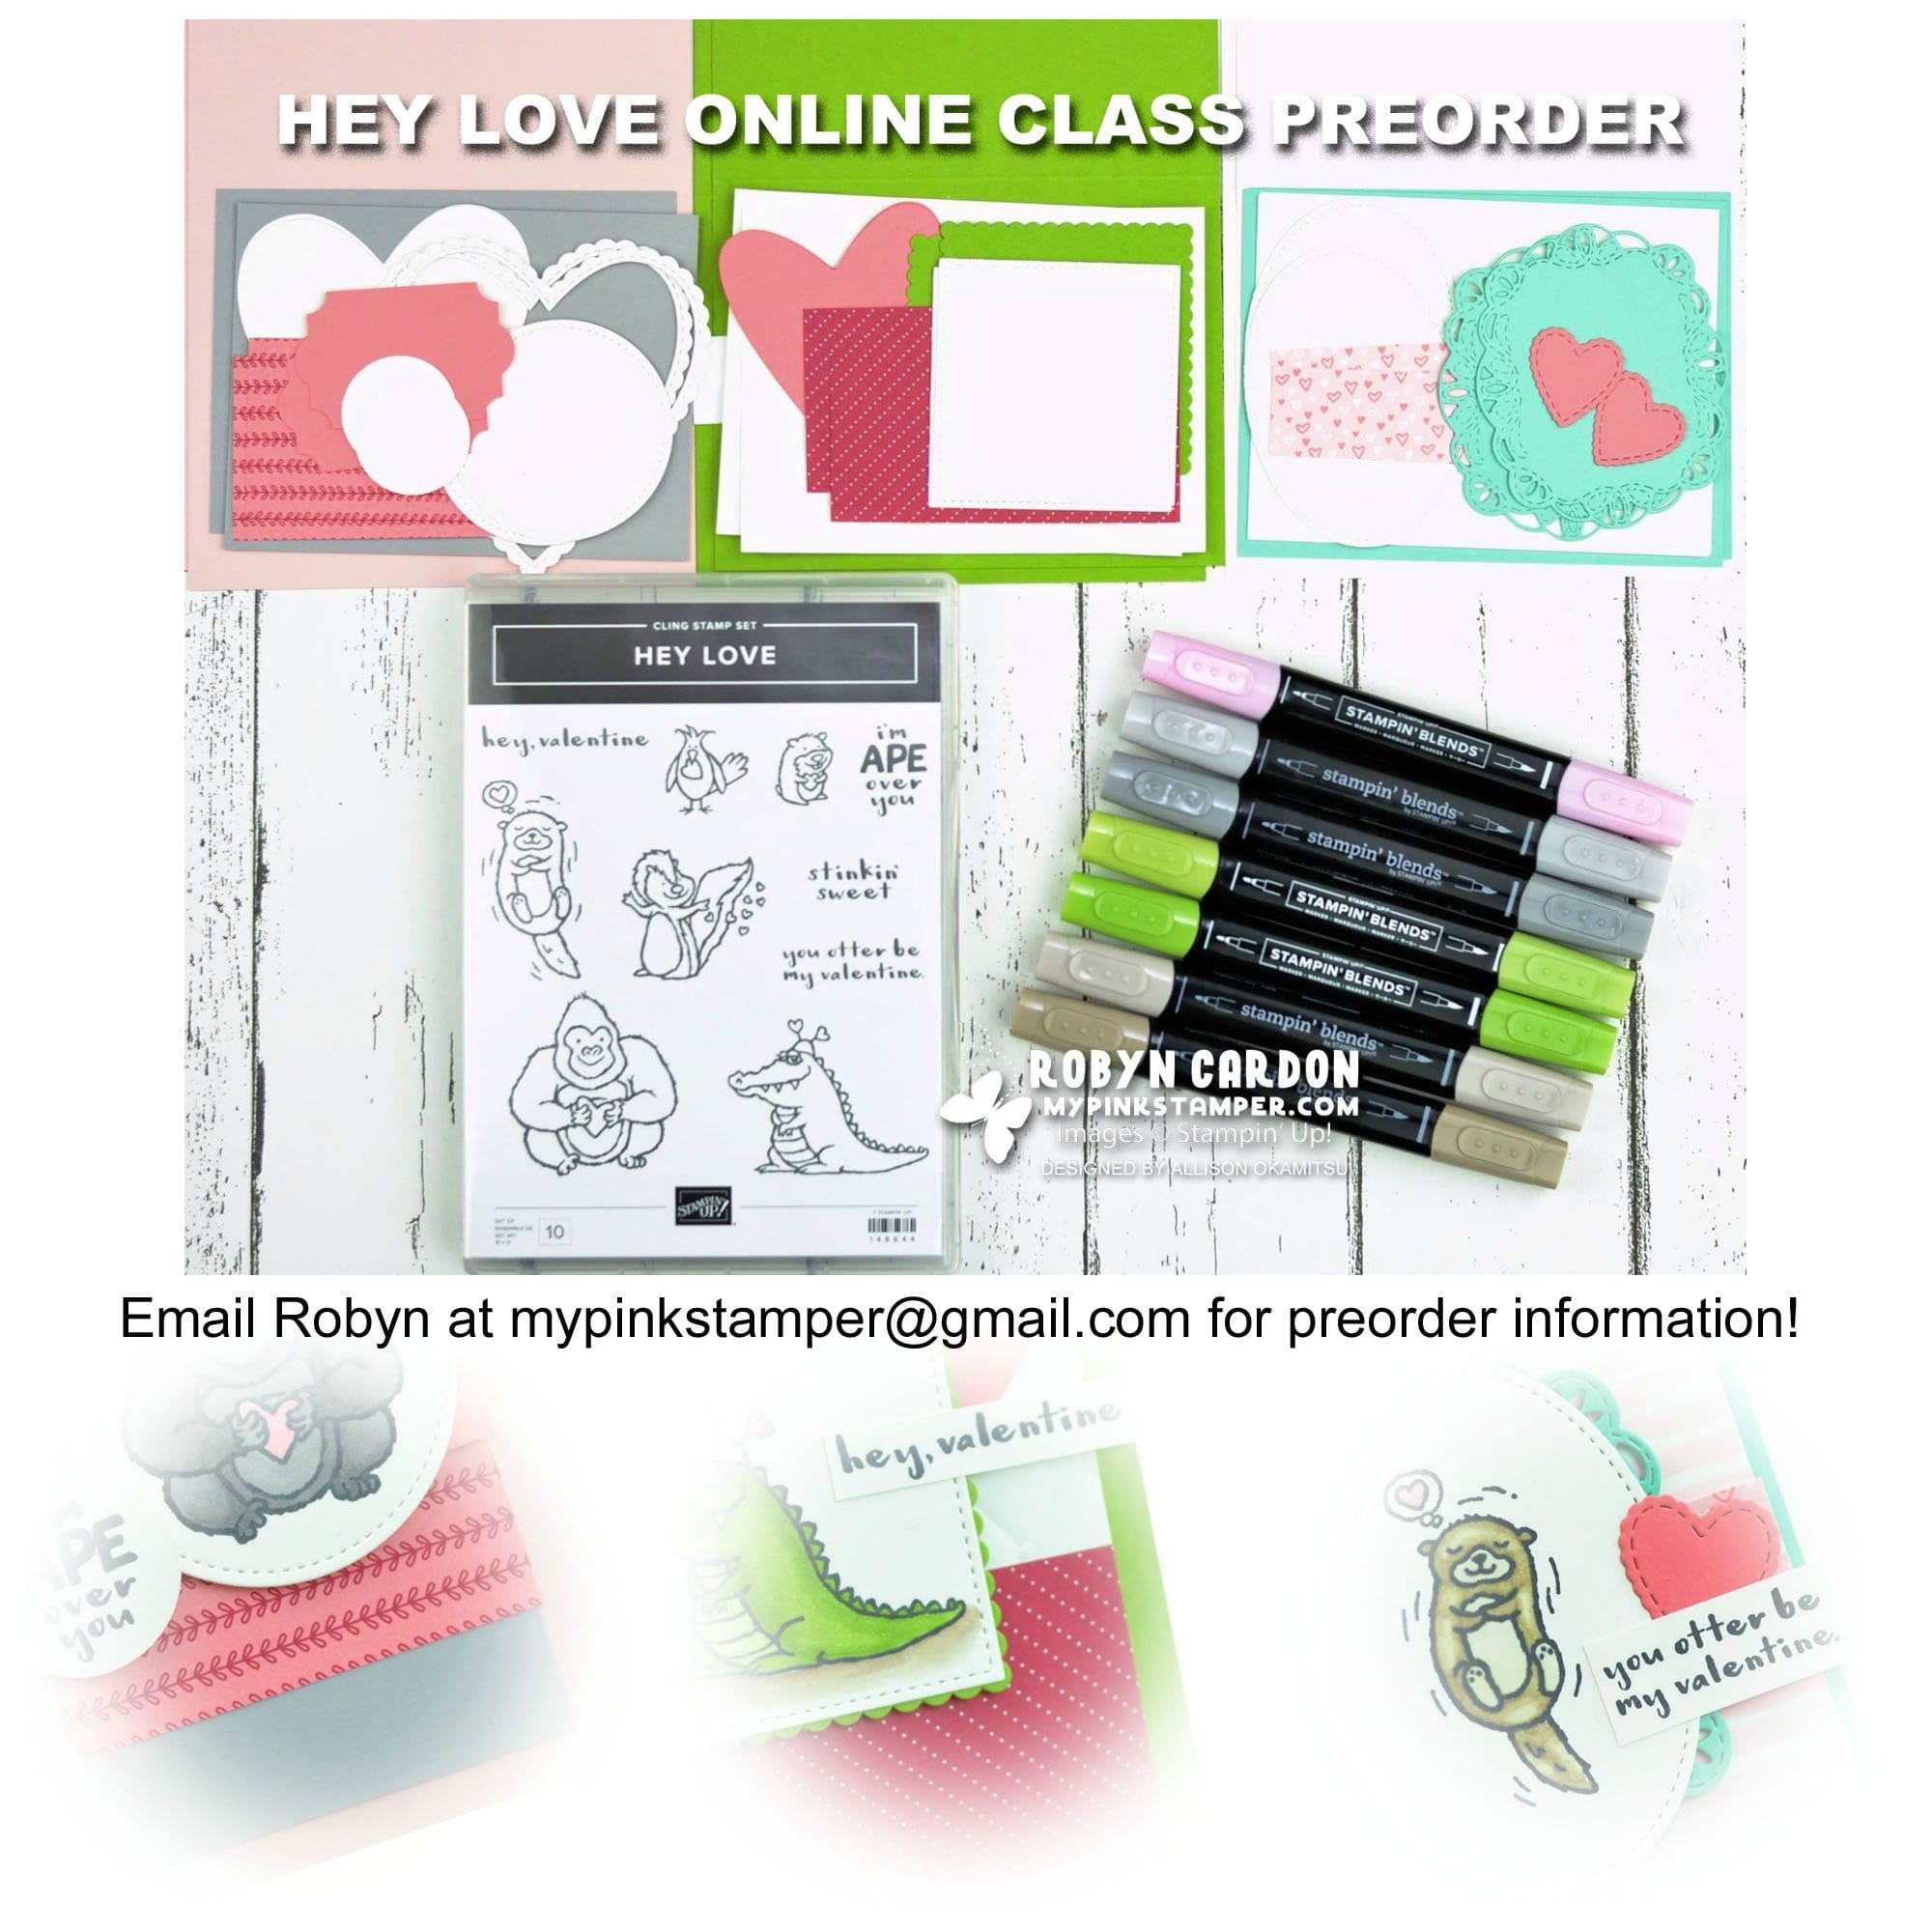 Hey Love Online Class Preorder